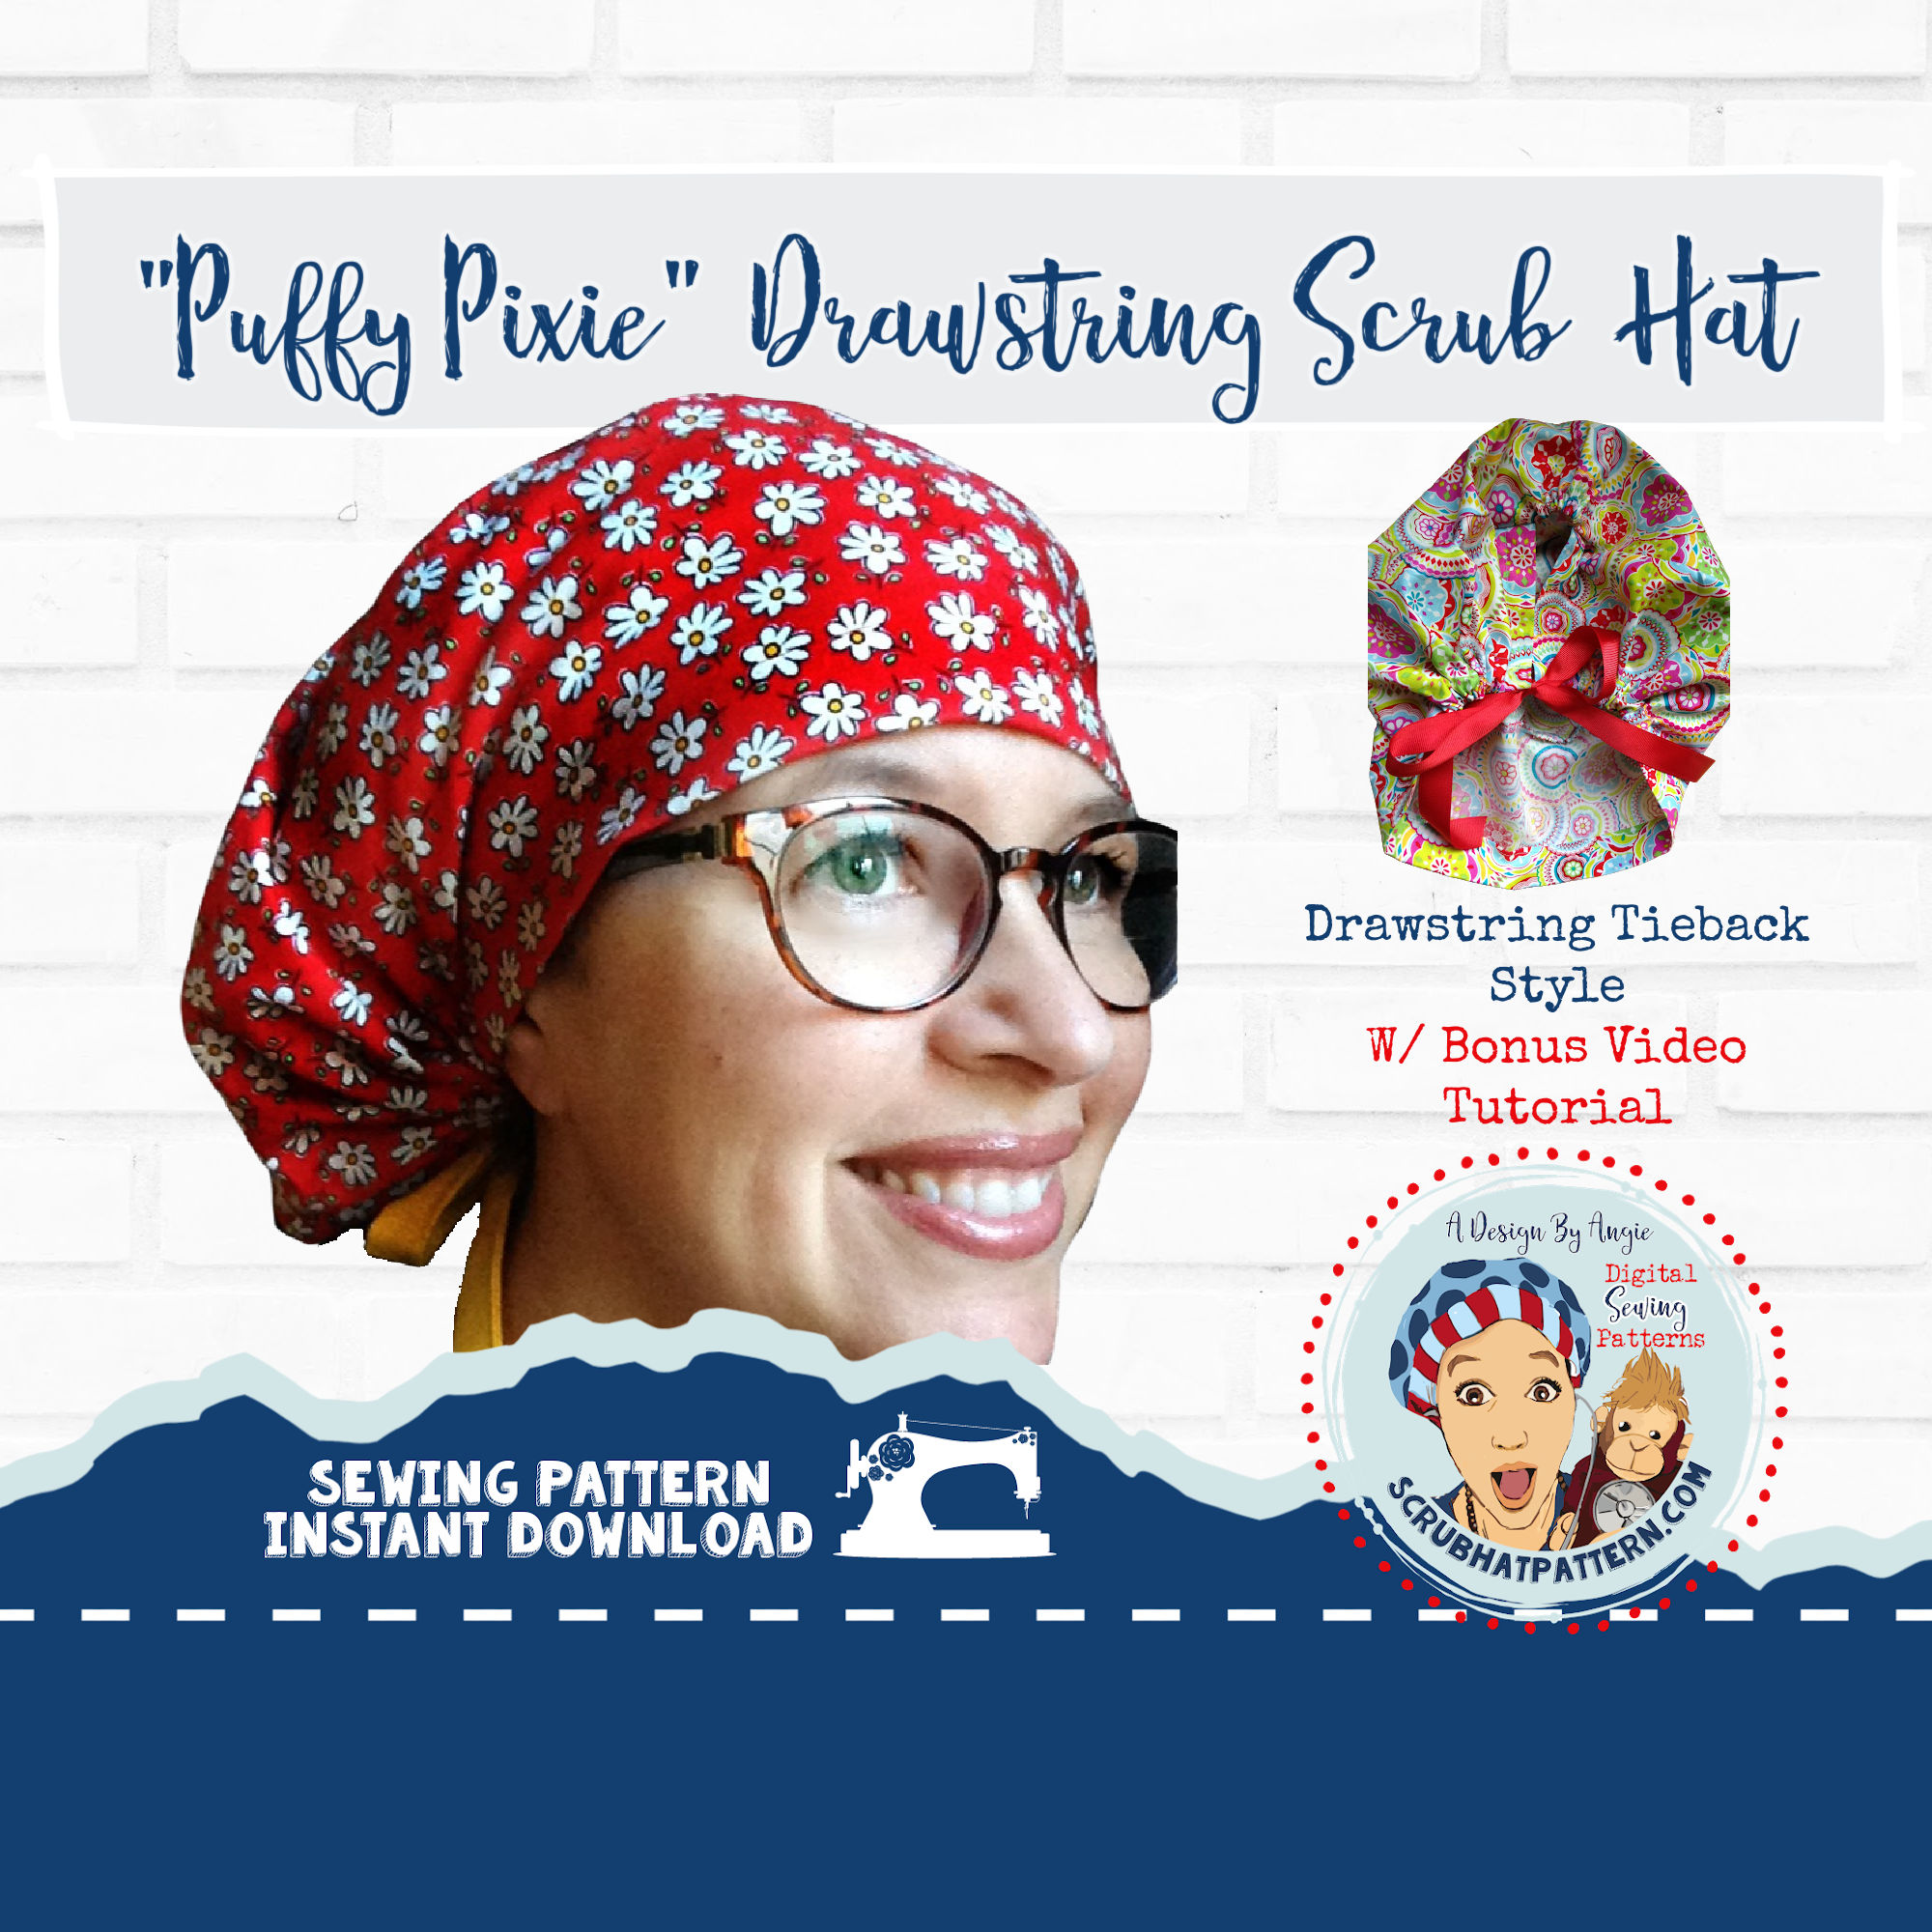 Puffy puxie Scrub Cap Sewing Pattern